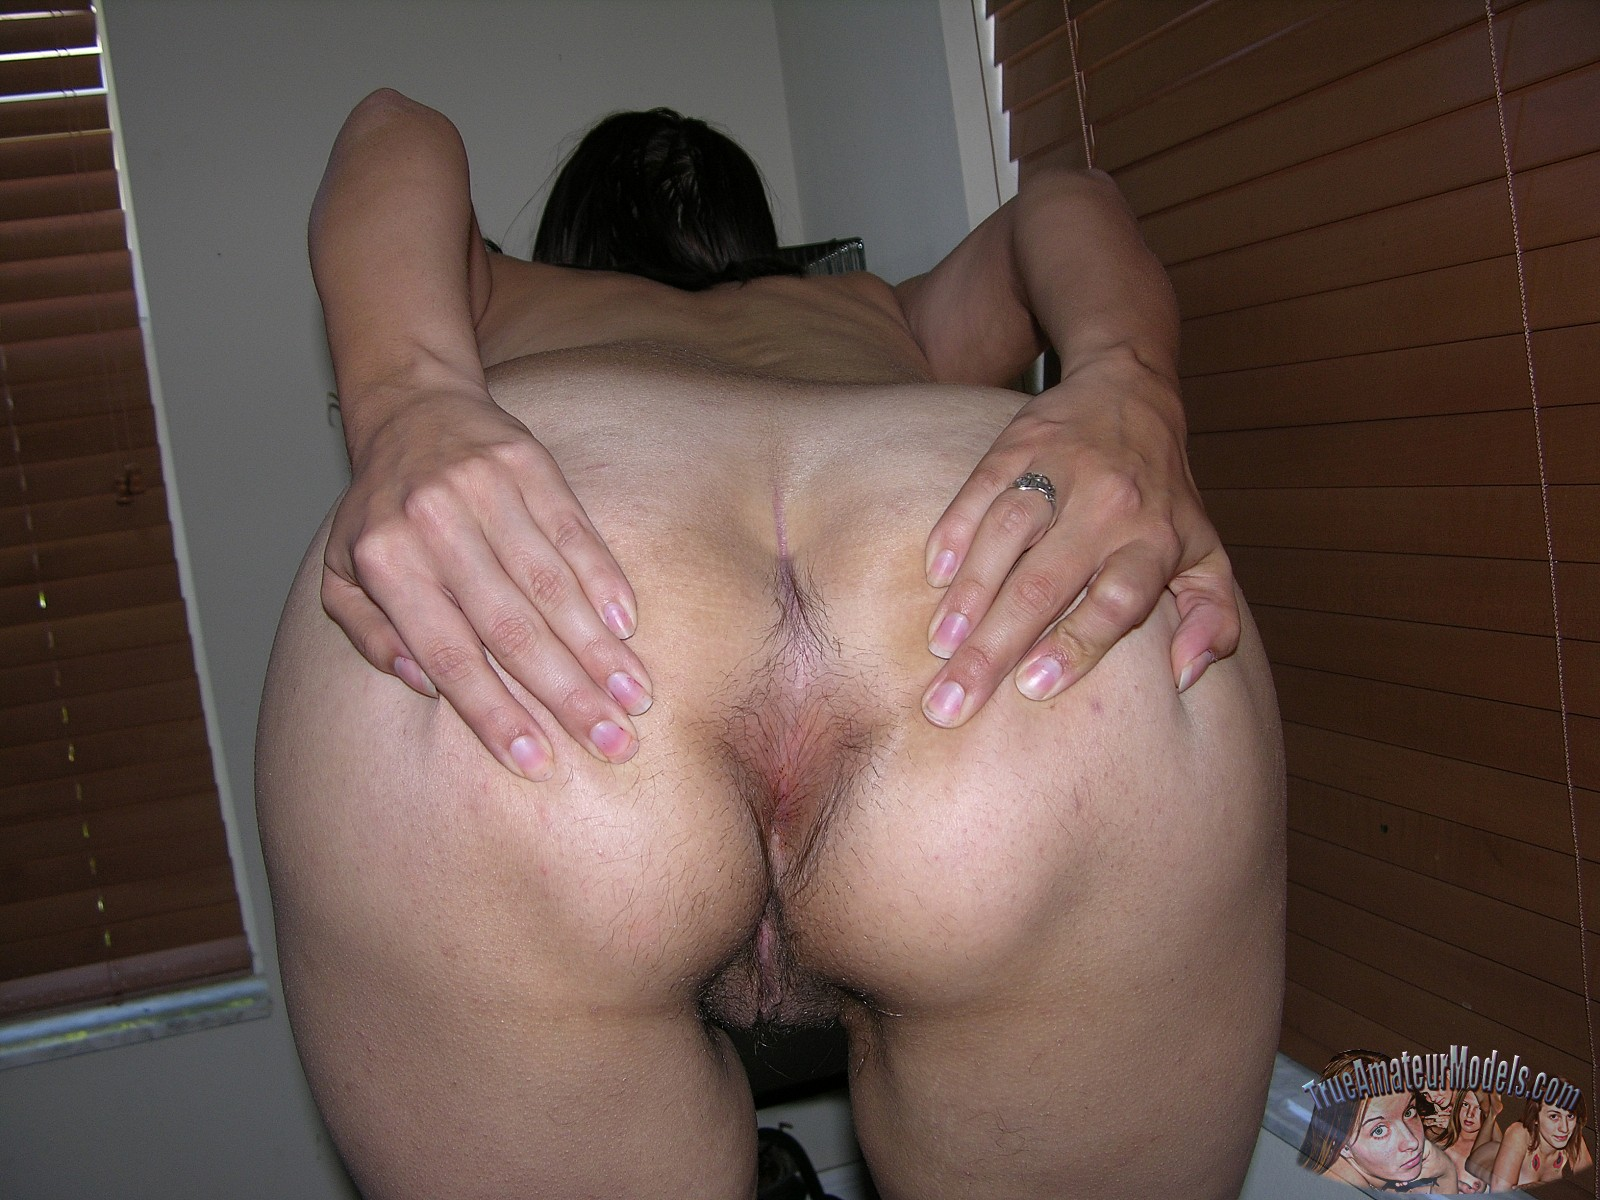 Teenage hot sex in car photo gallery